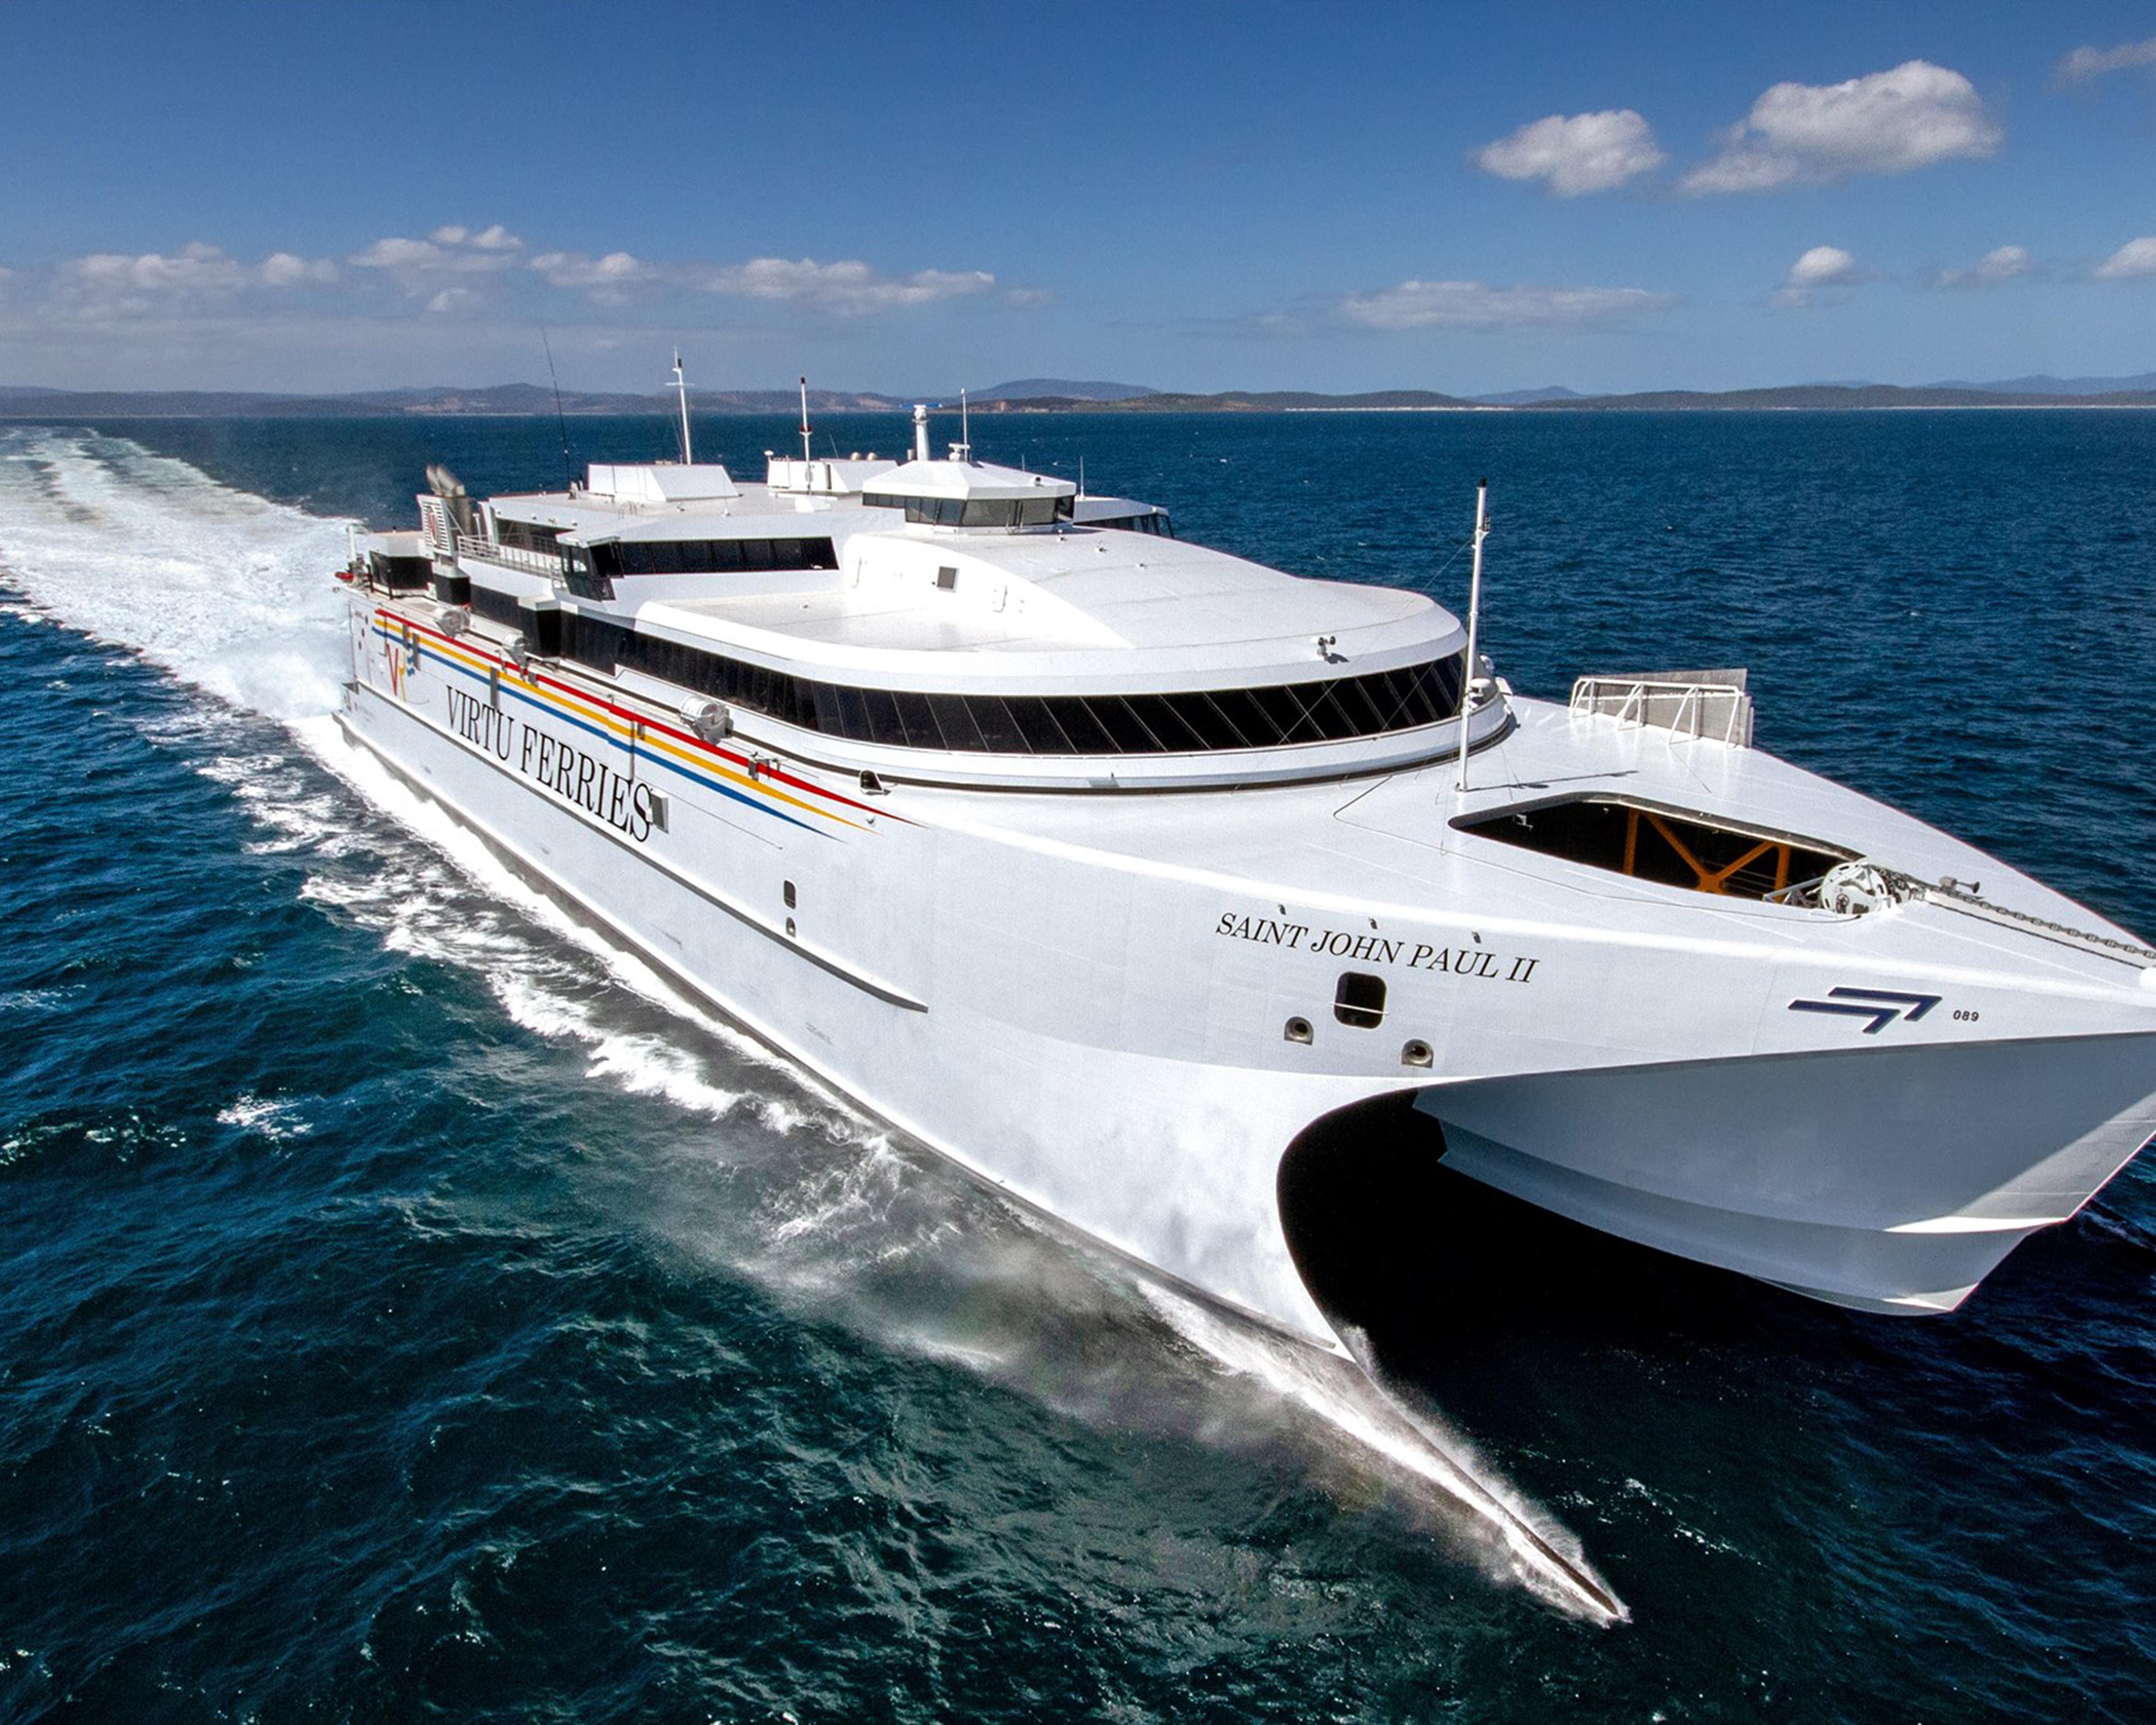 Malta-Gozo fast ferry?